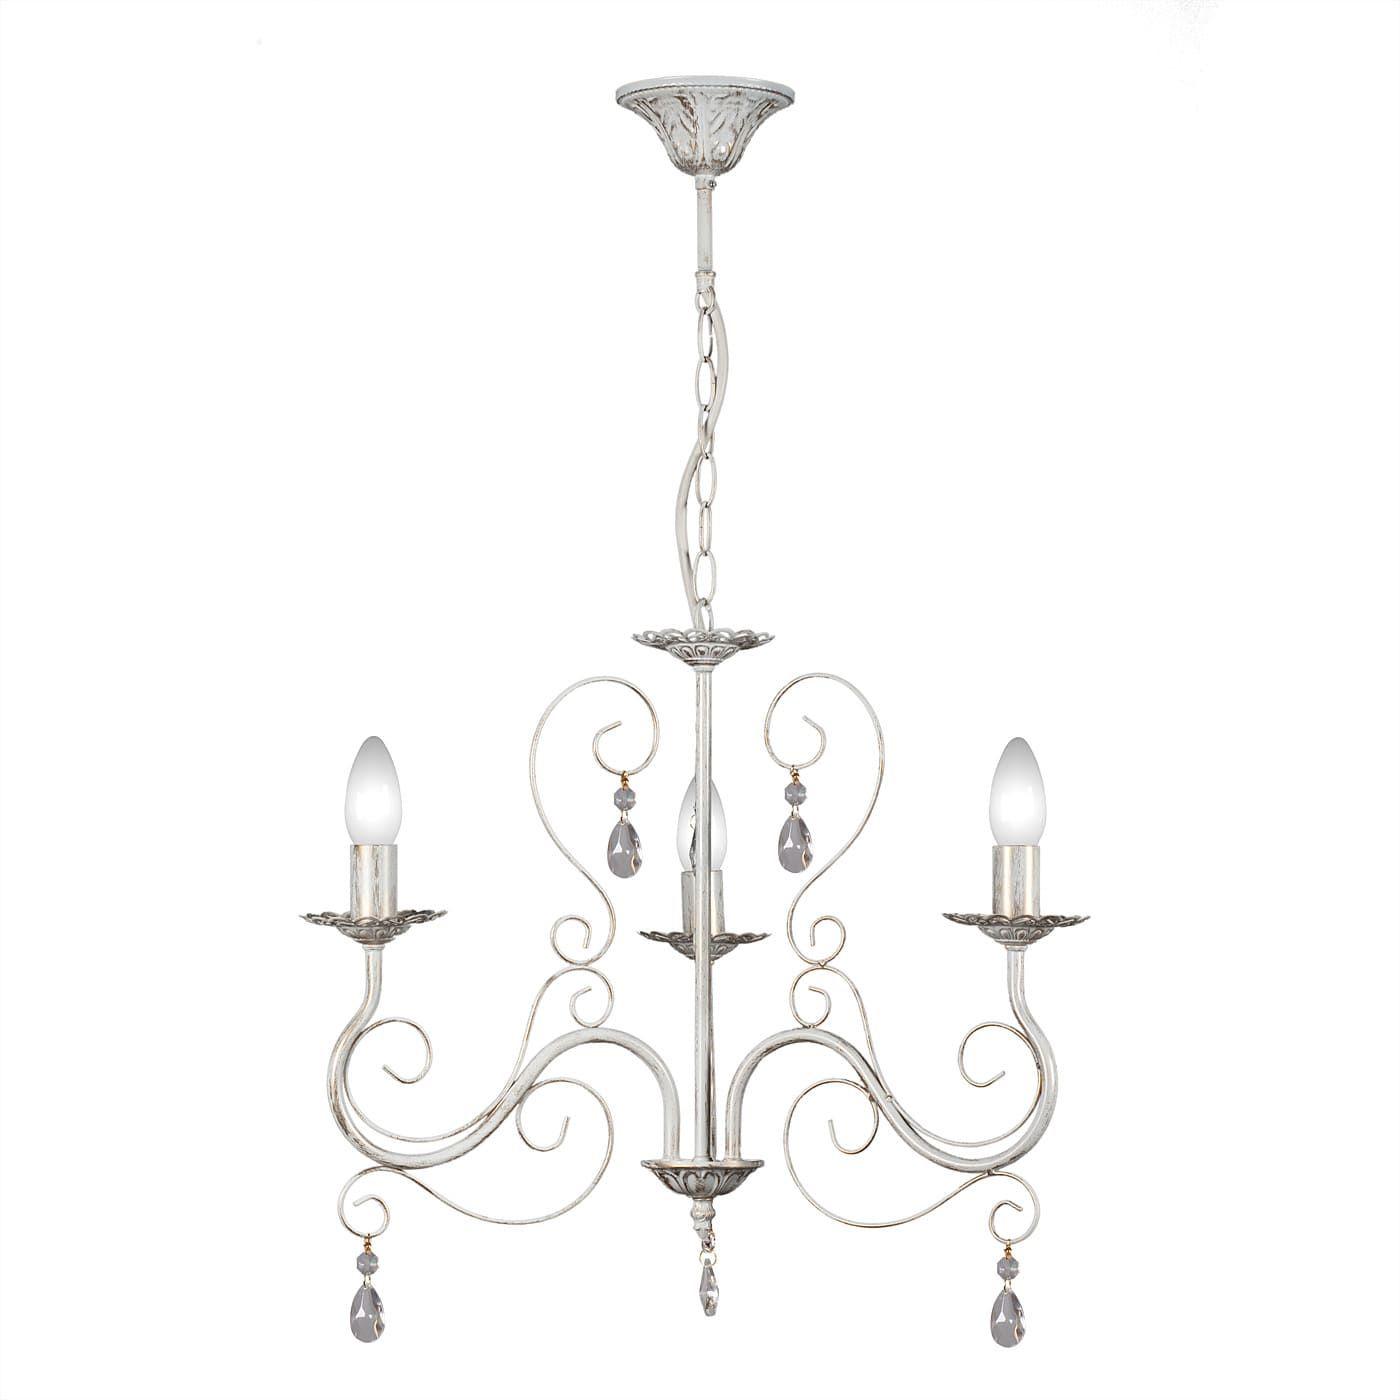 PETRASVET / Pendant chandelier S1021-3, 3xE14 max. 60W